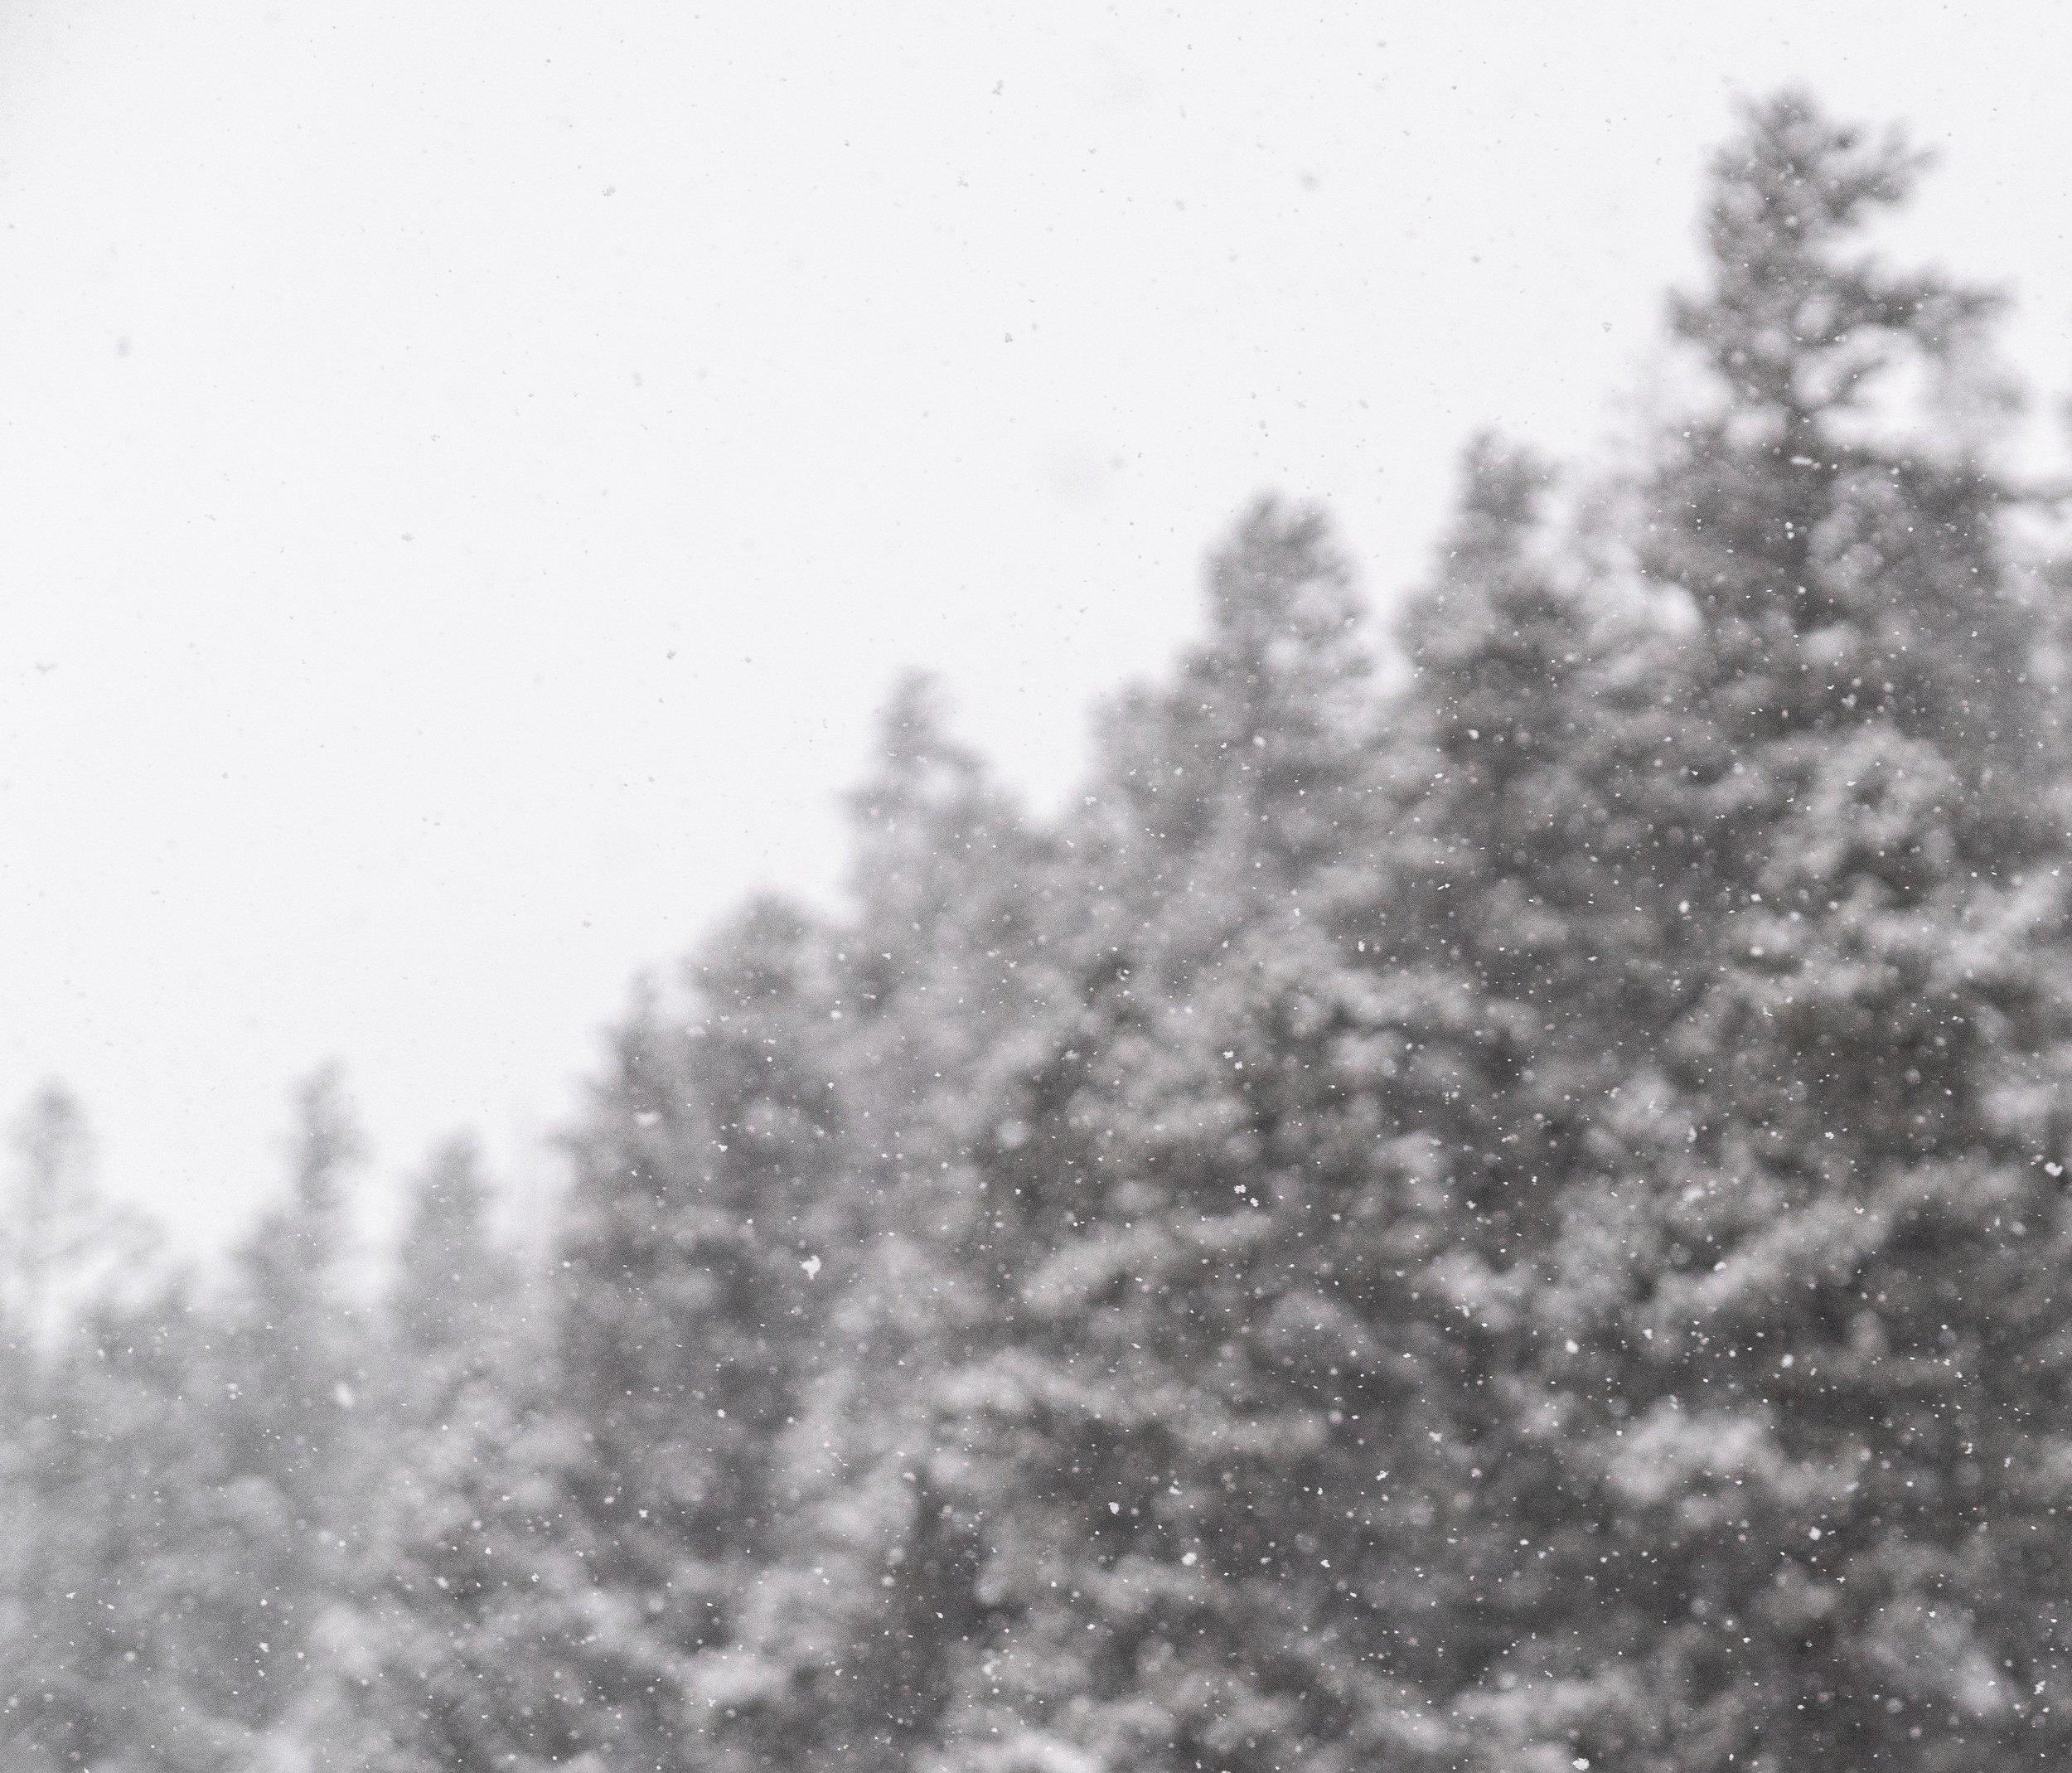 Winter_1 copy.jpg